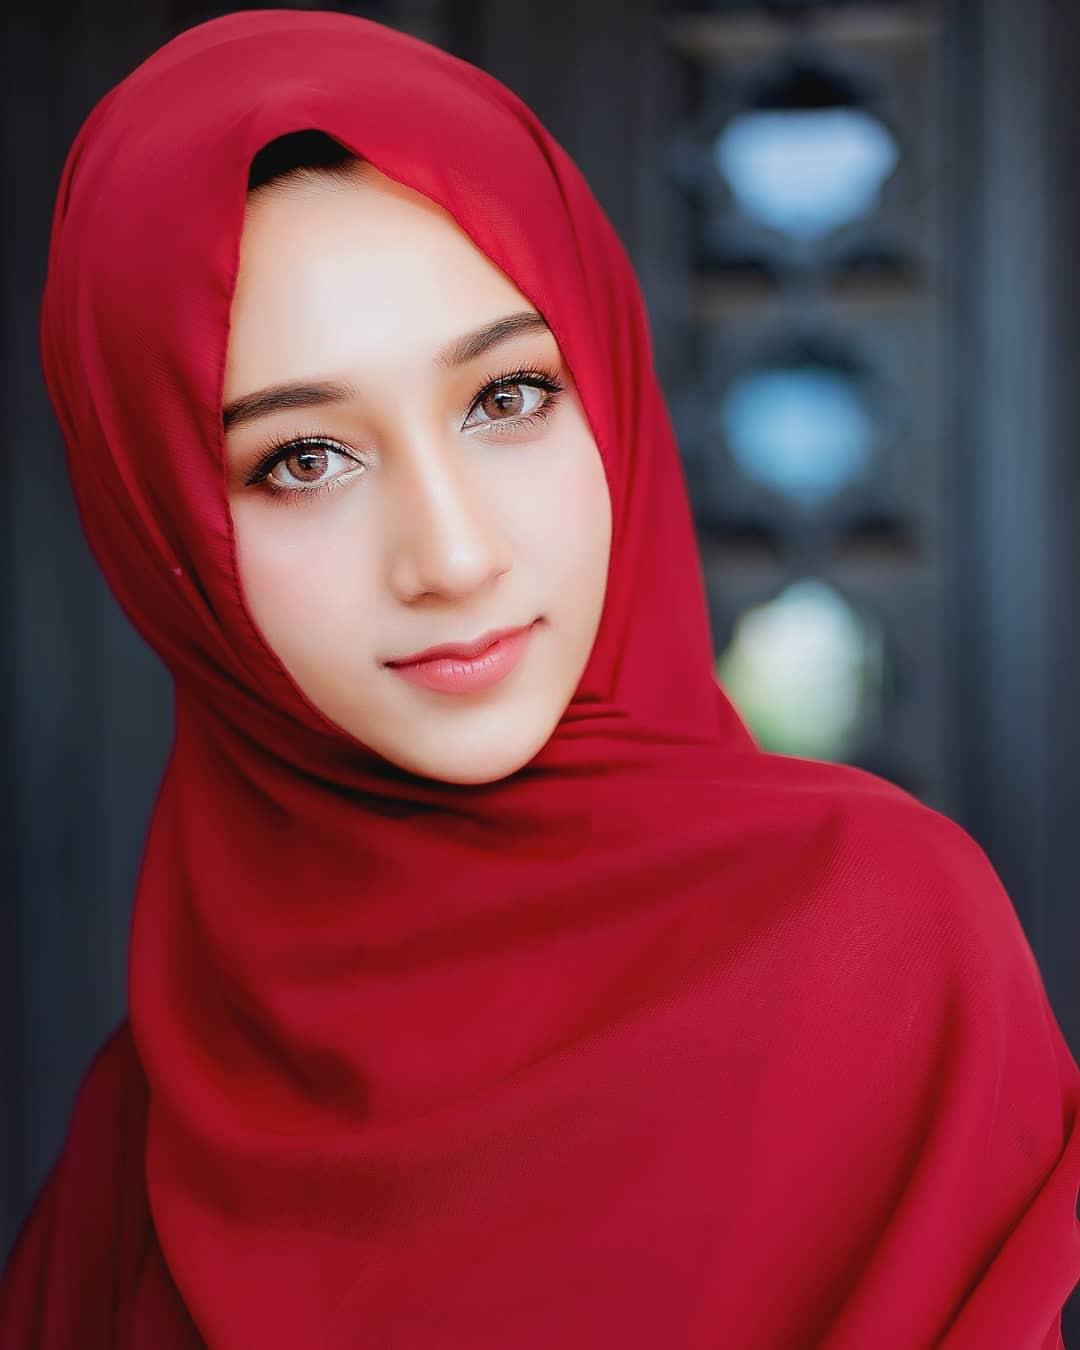 Tiny muslim woman saree